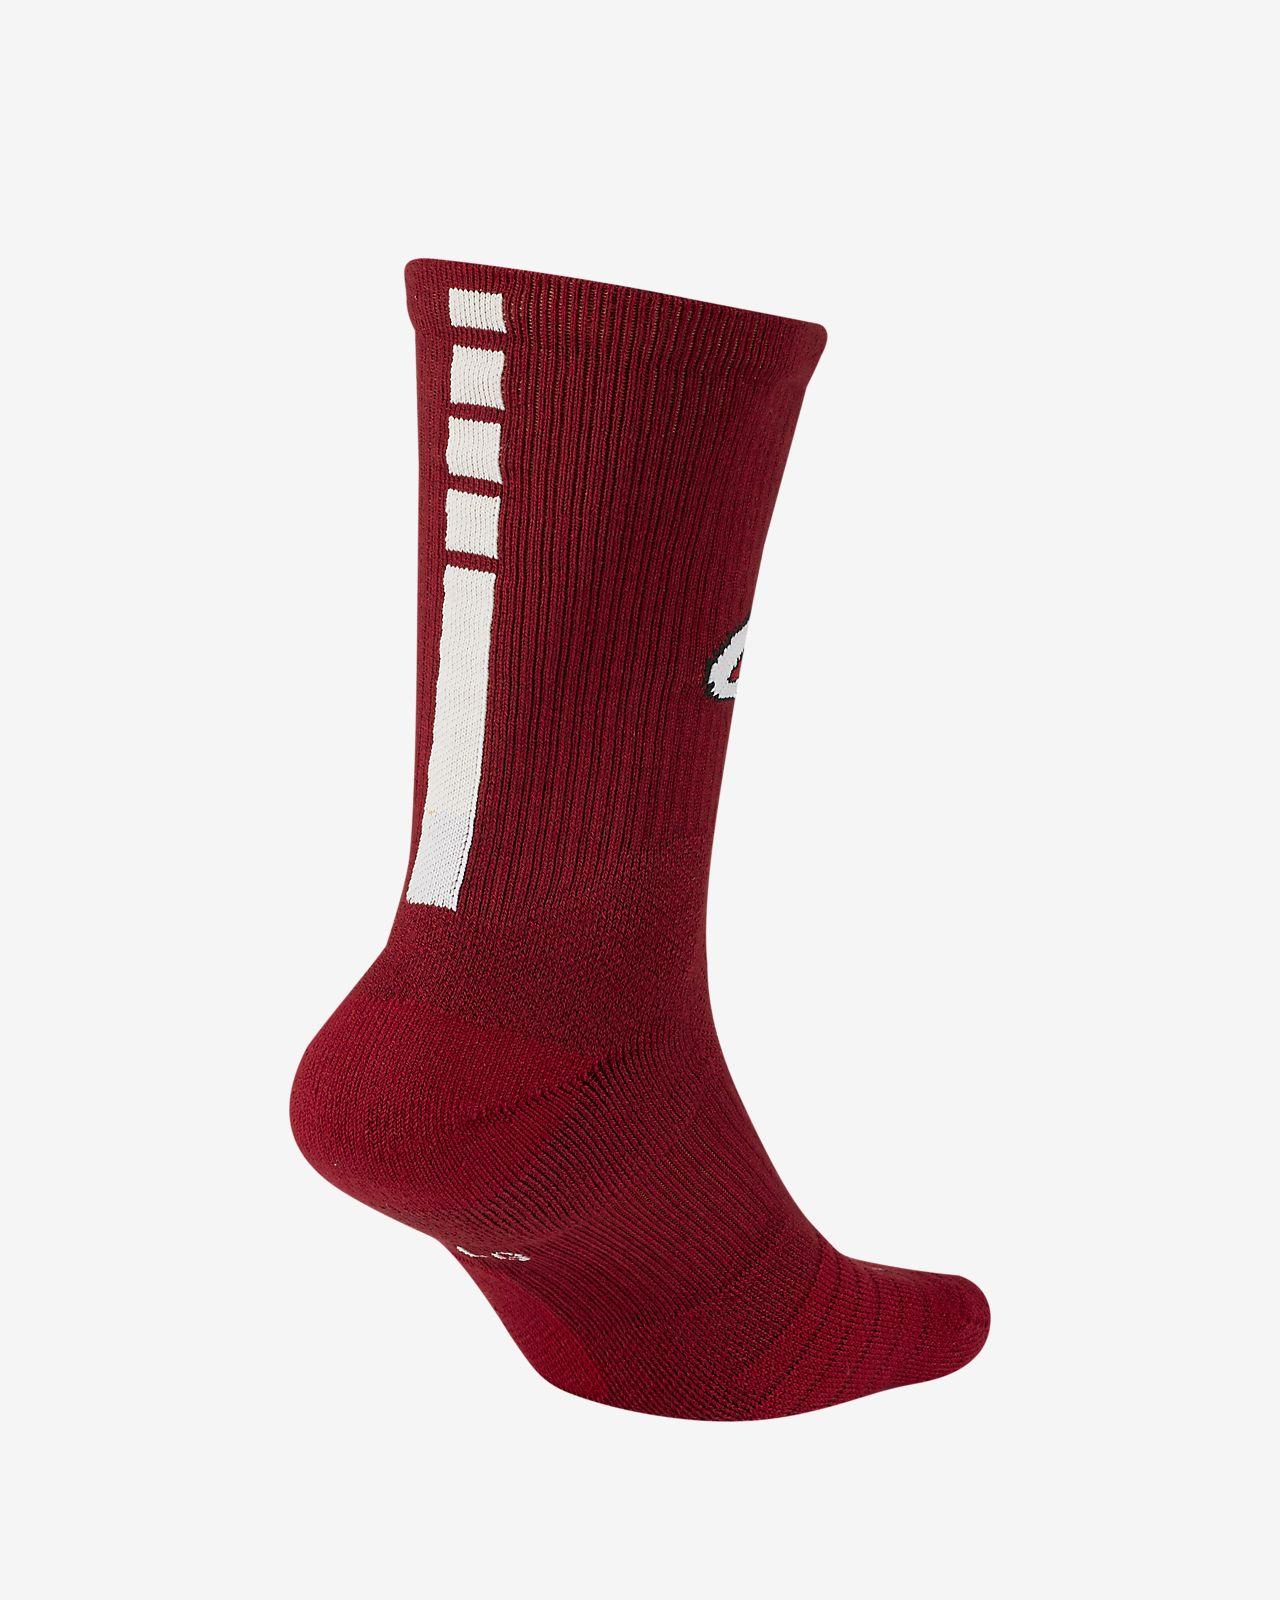 Miami Heat Nike Elite NBA Crew Socks